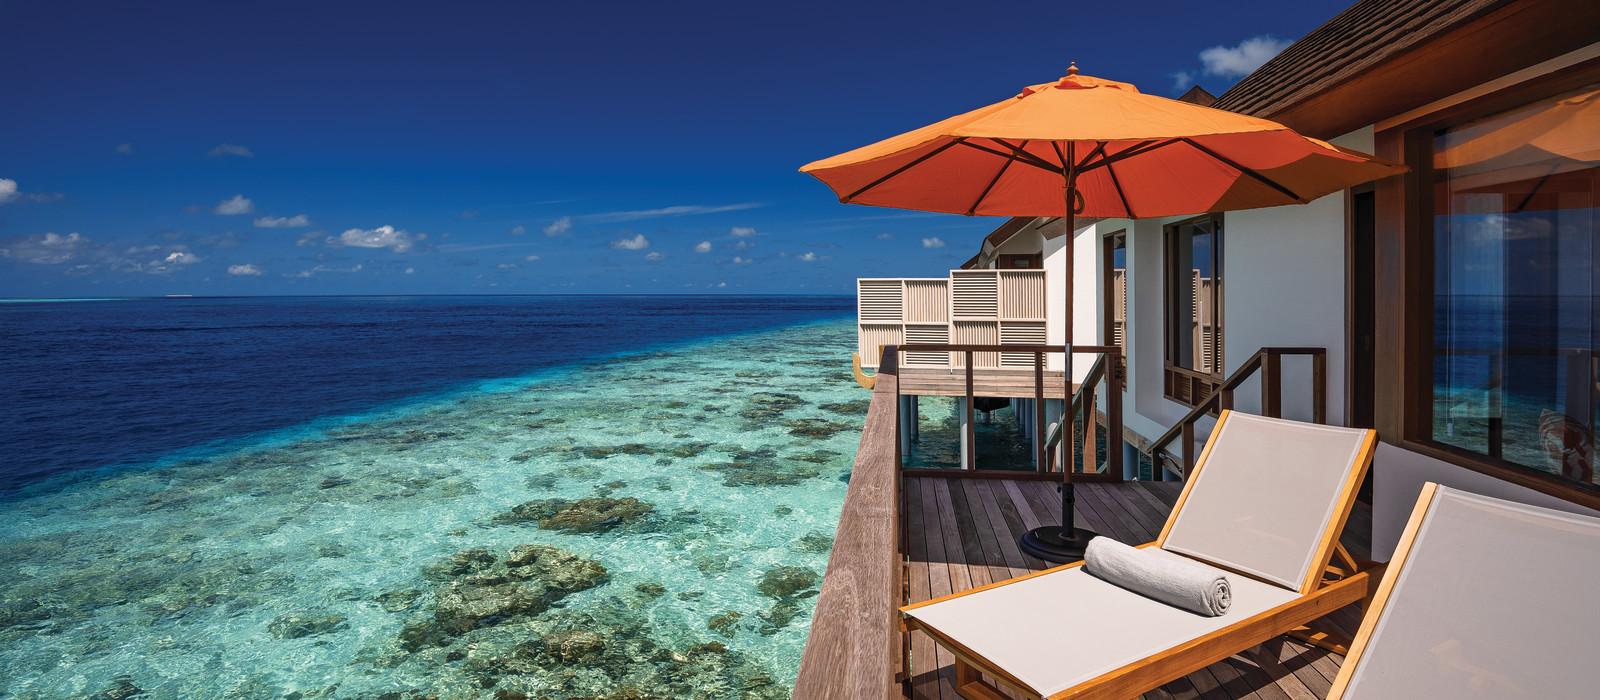 Hotel OBLU SELECT at Sangeli Maldives